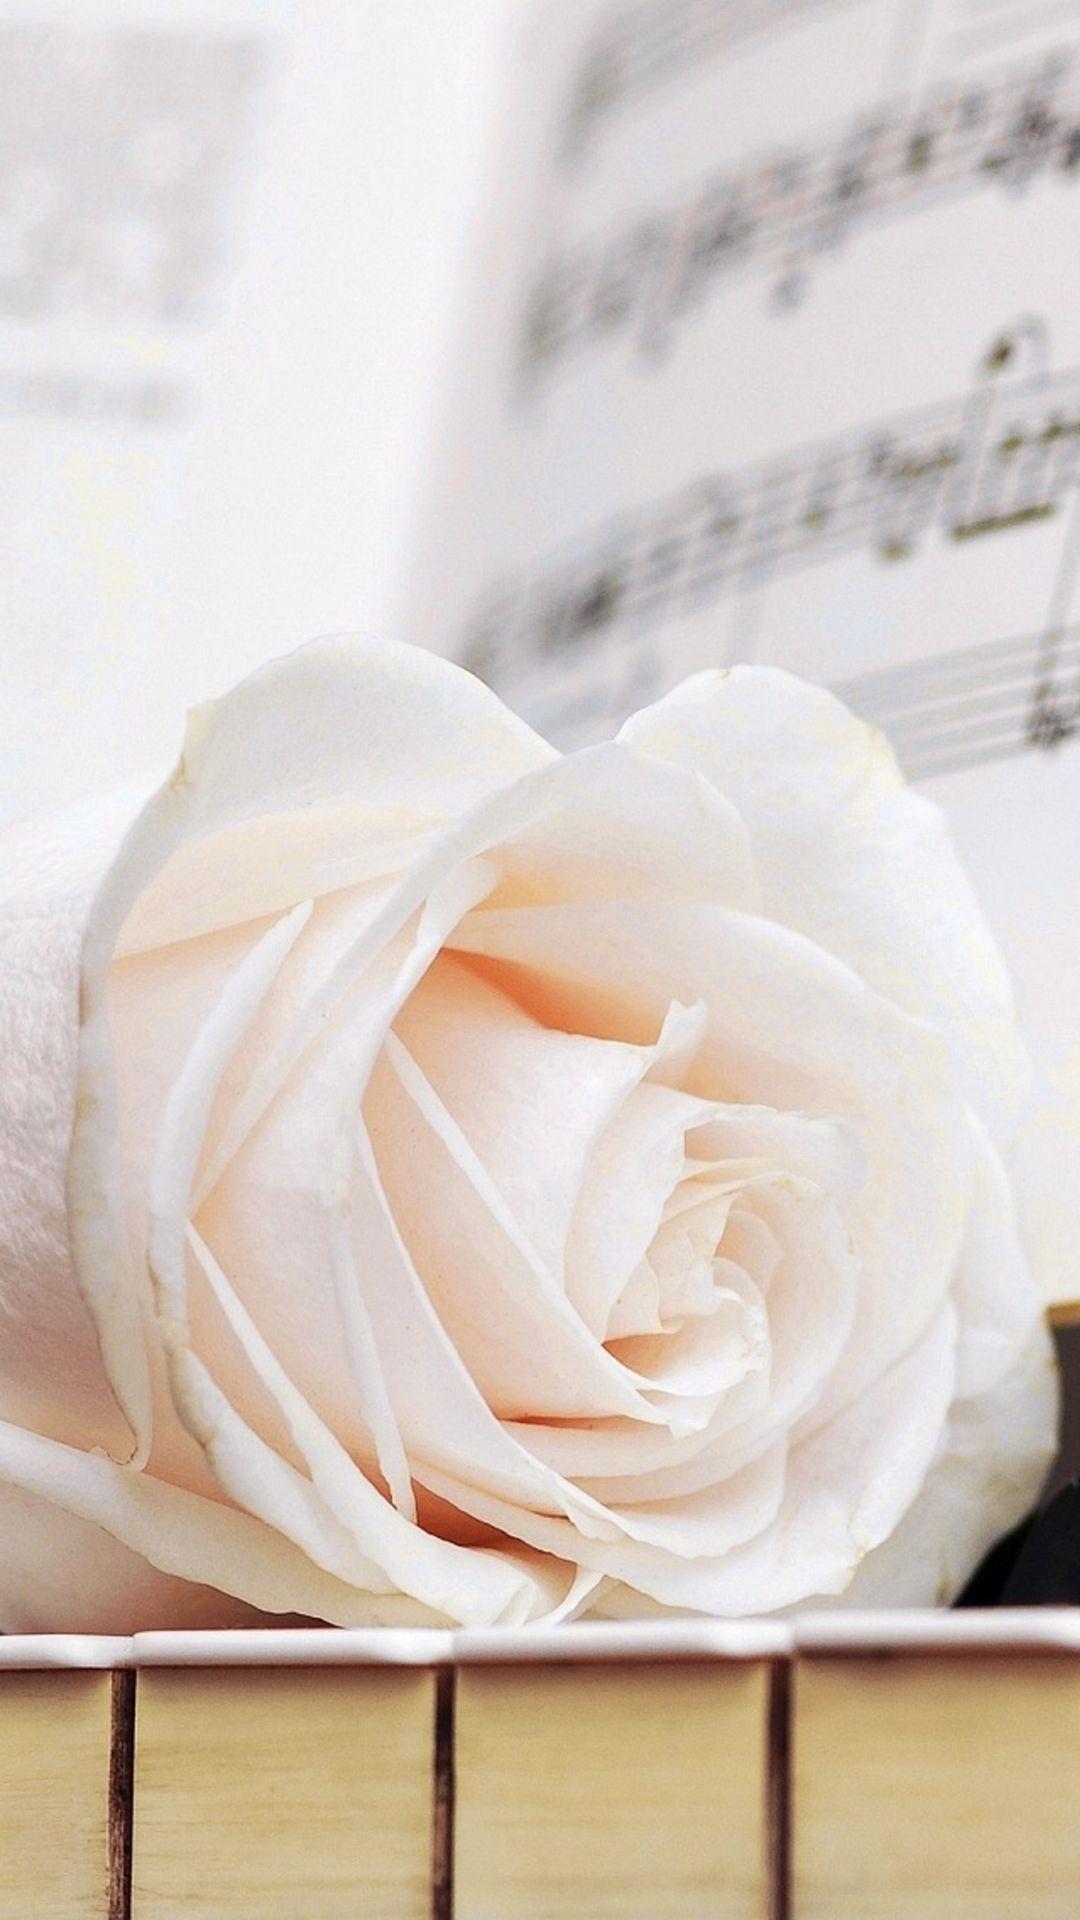 Pure Elegant Rose Flower Macro Music Note Book Piano